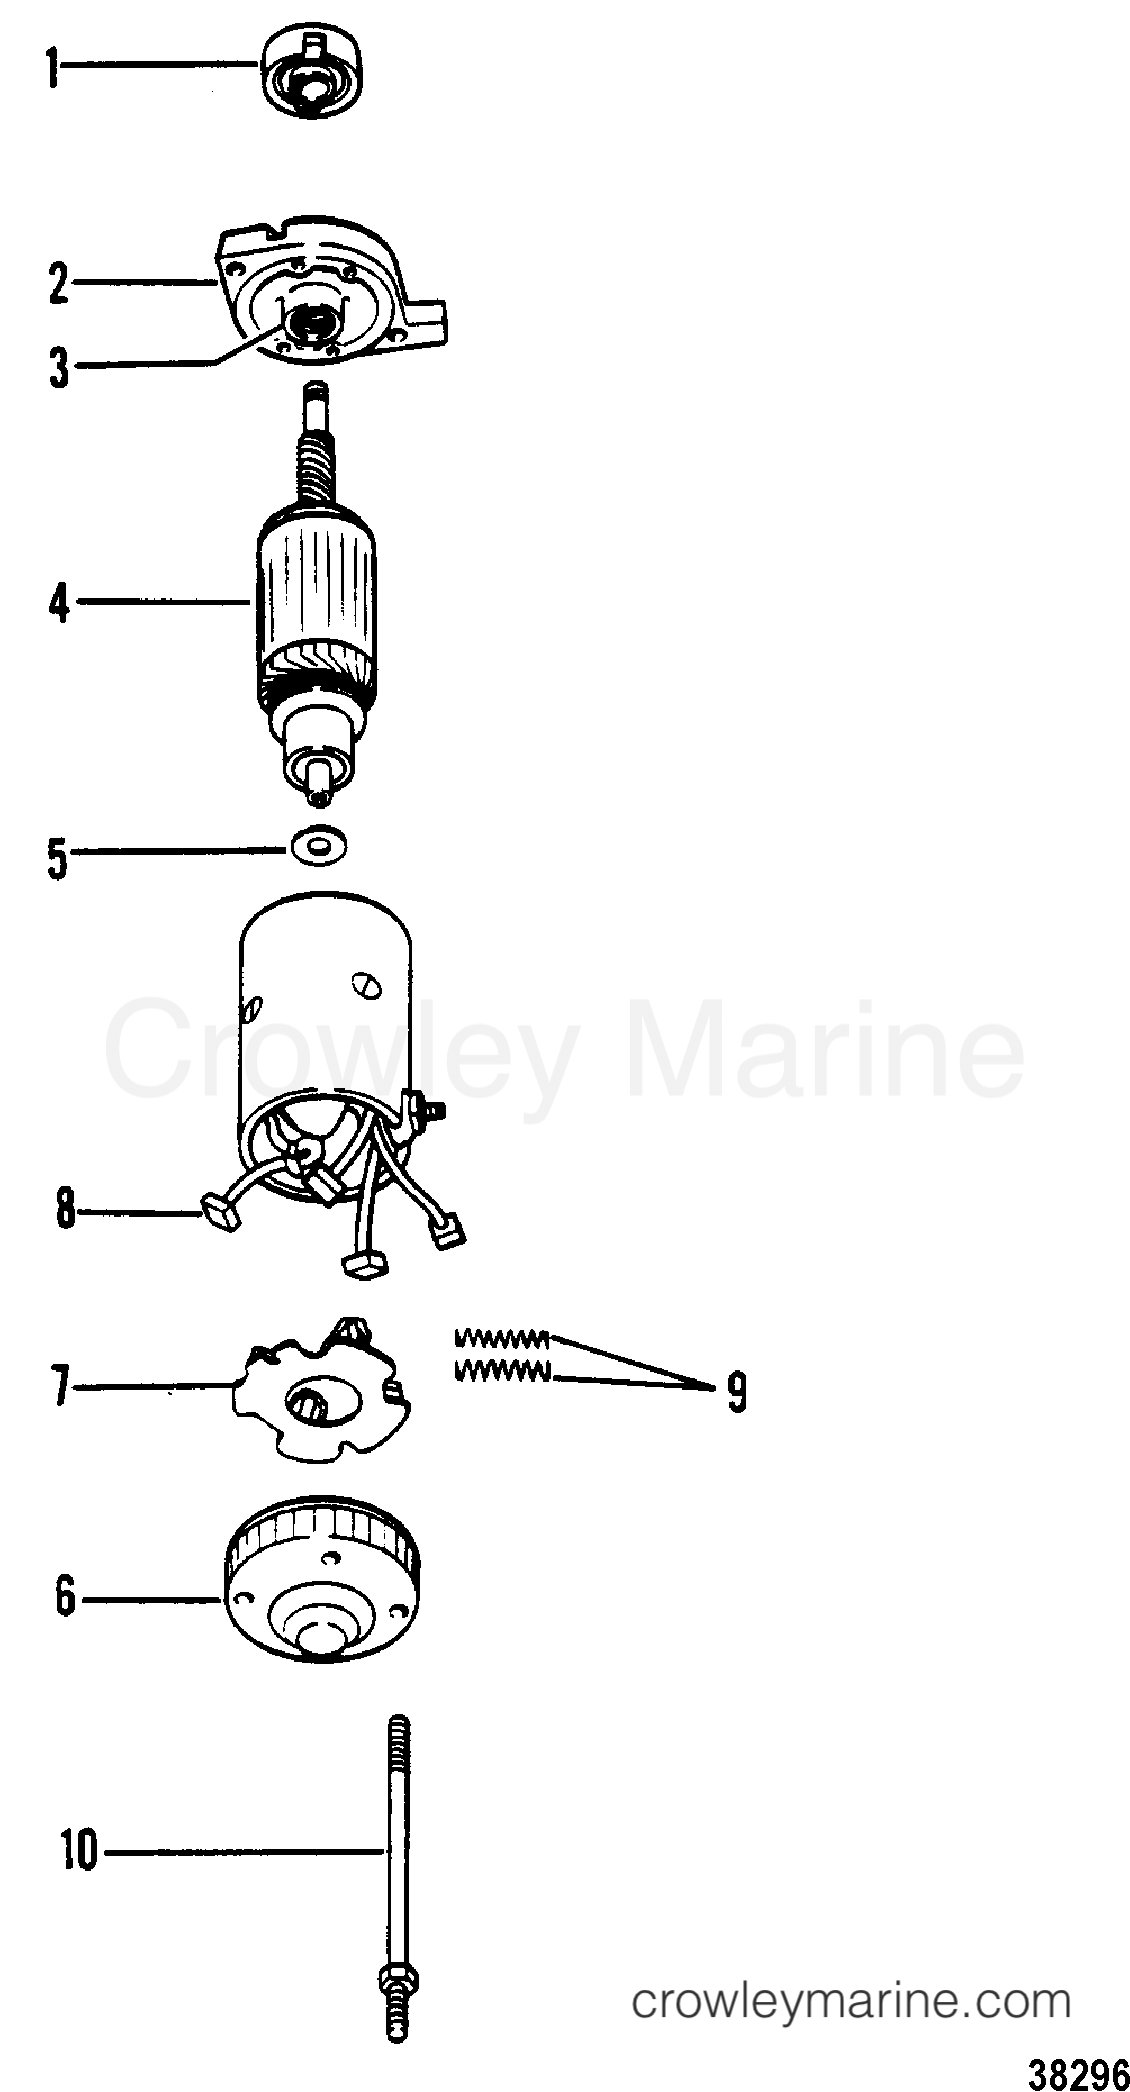 1980 Mercury Outboard 70 [ELPT] -  1070620 - STARTER MOTOR ASSEMBLY(PRESTOLITE) section